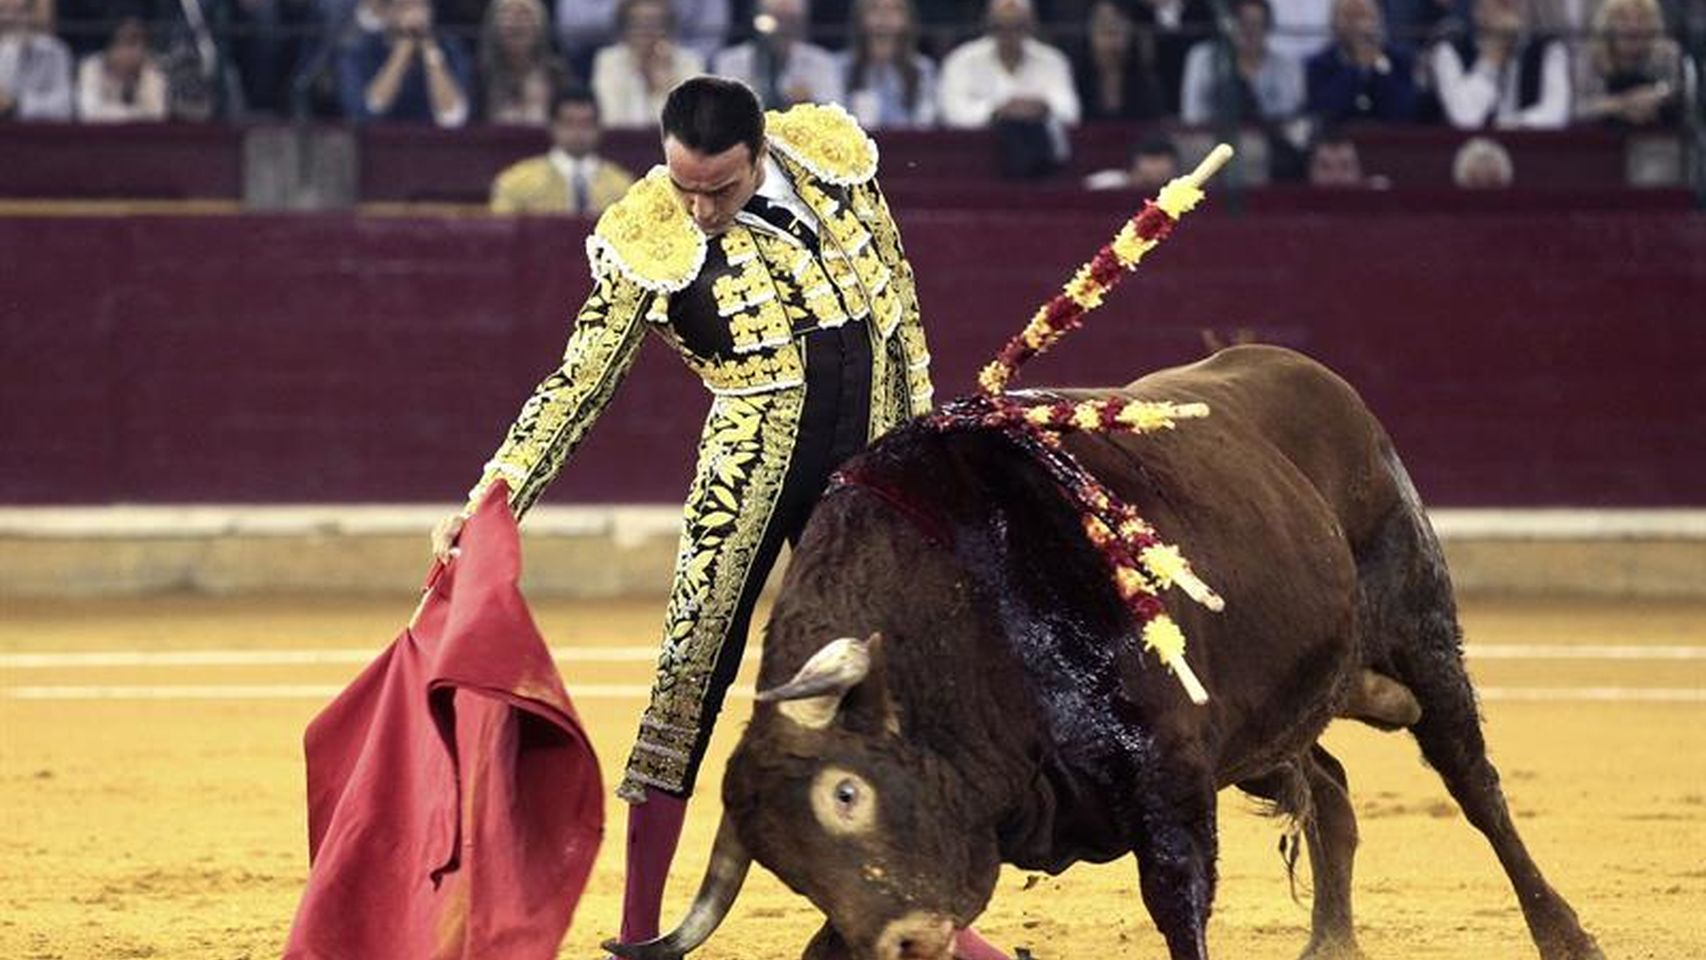 corridas_toros-enrique_ponce-toreros-zaragoza-toros_162247333_18757495_1706x960